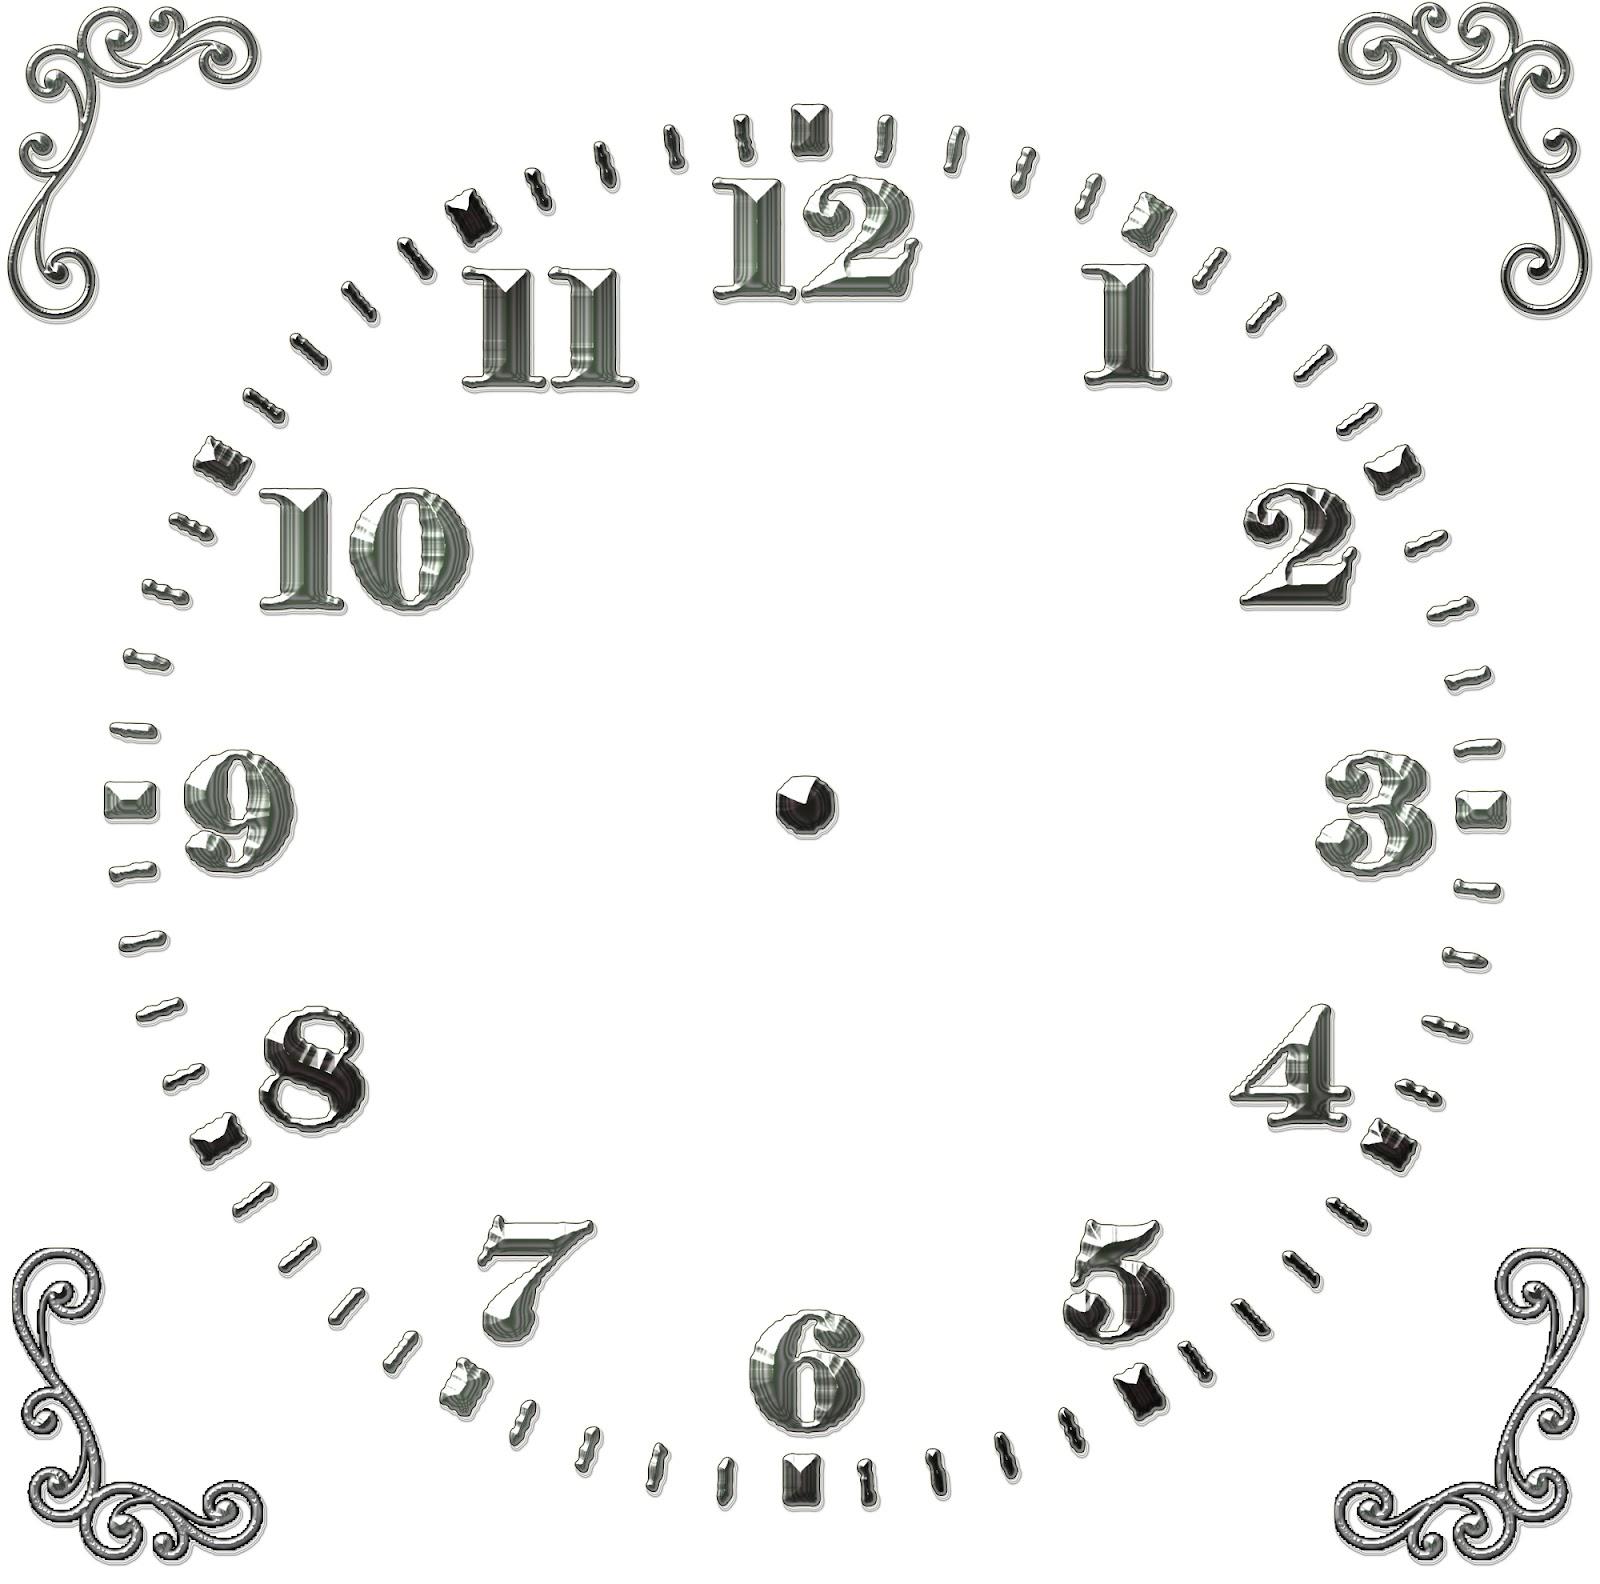 Циферблат на часы своими руками